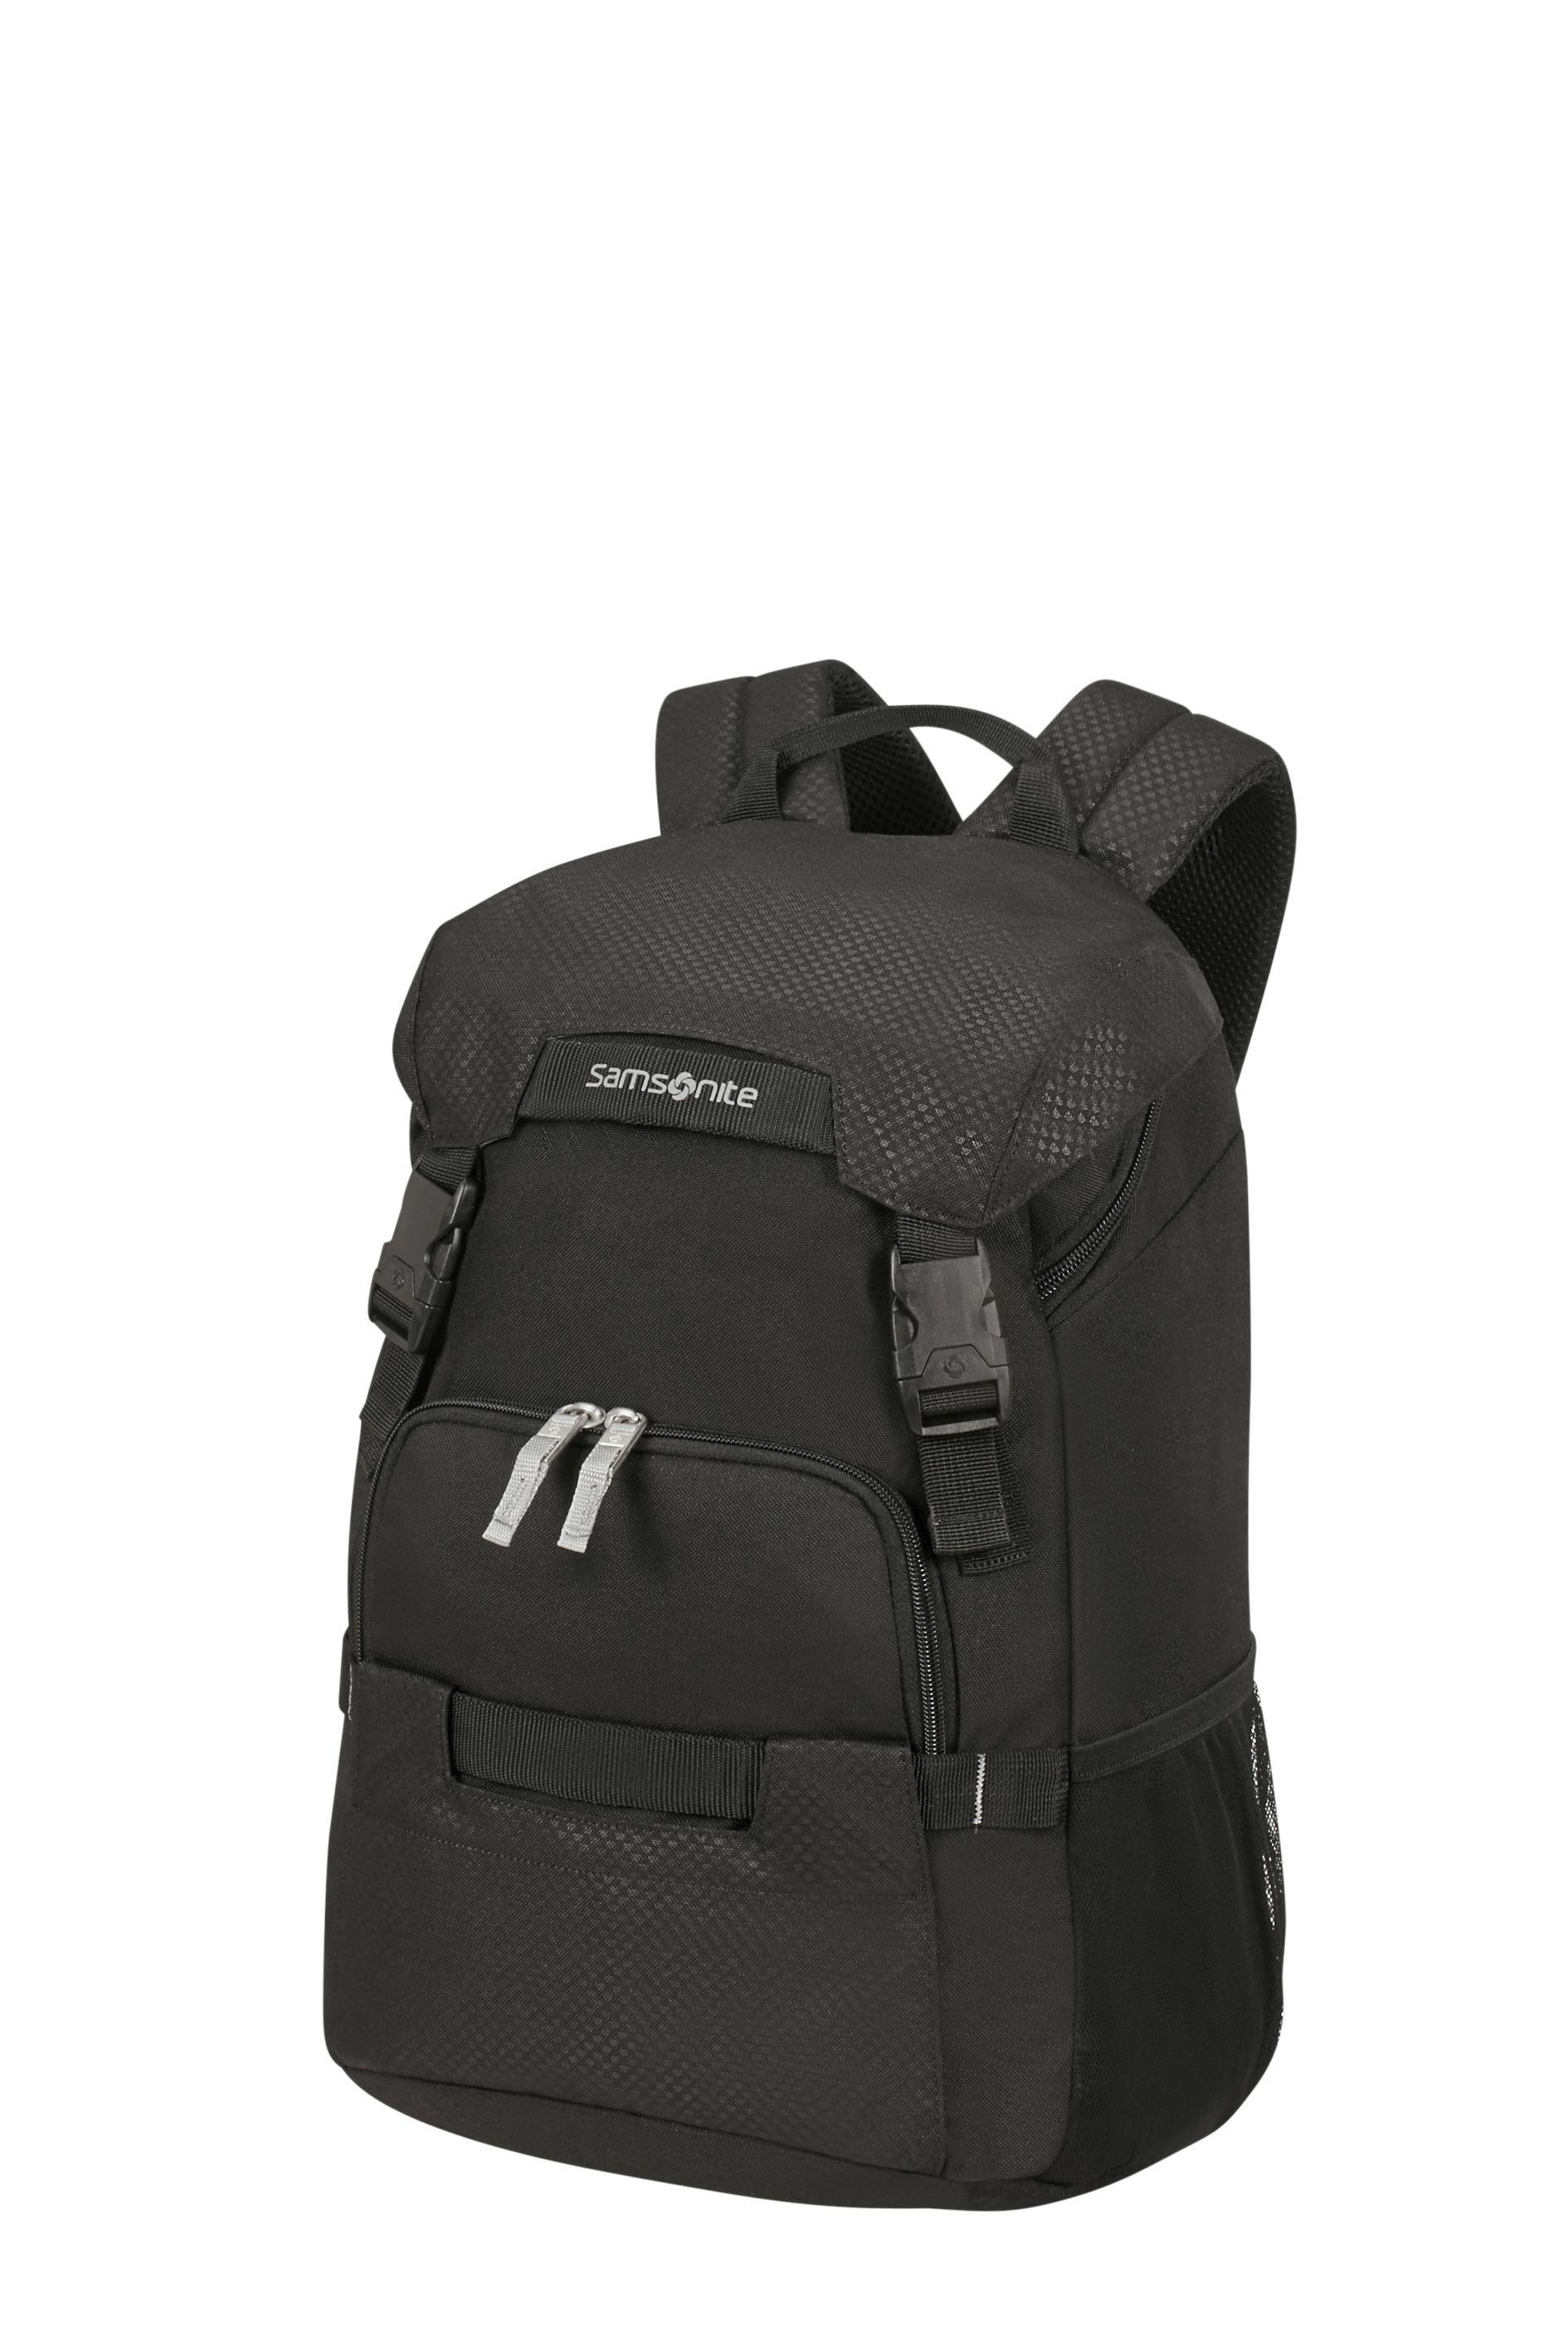 Samsonite Sonora Laptop Backpack M